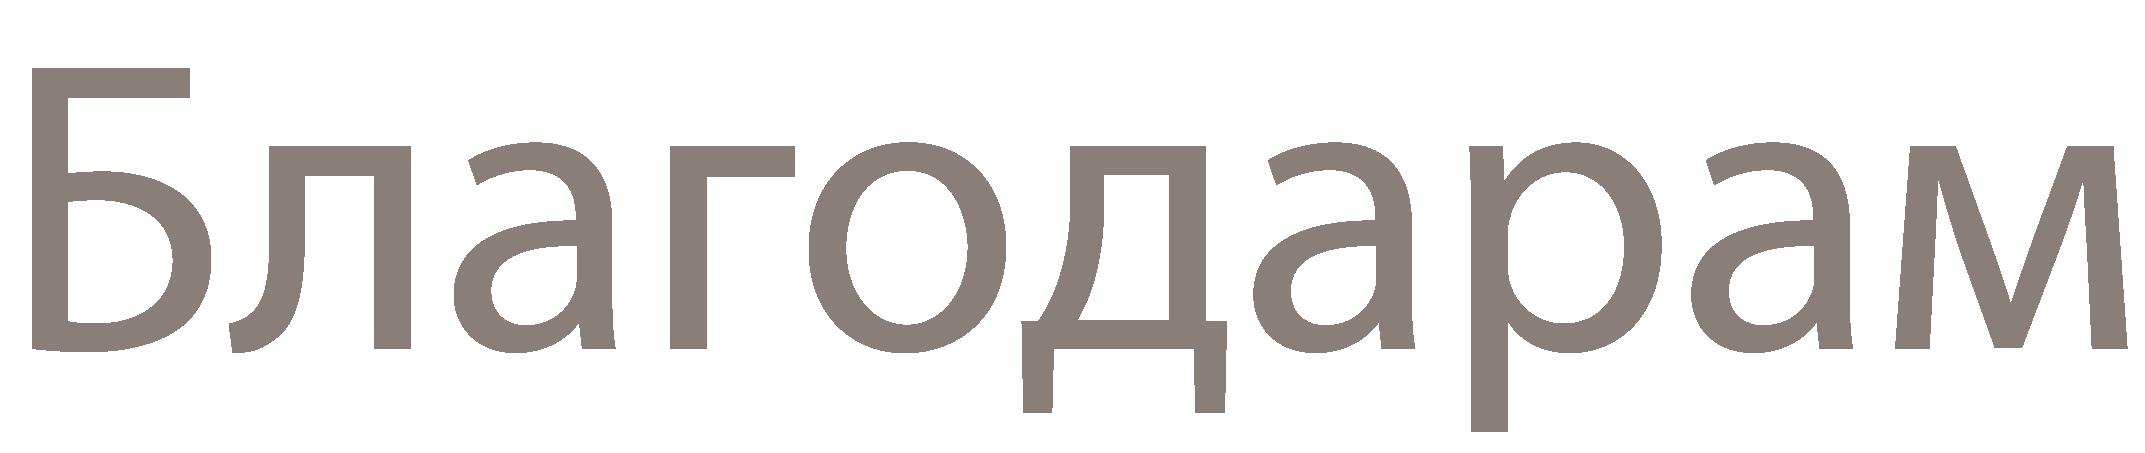 cirillico.png